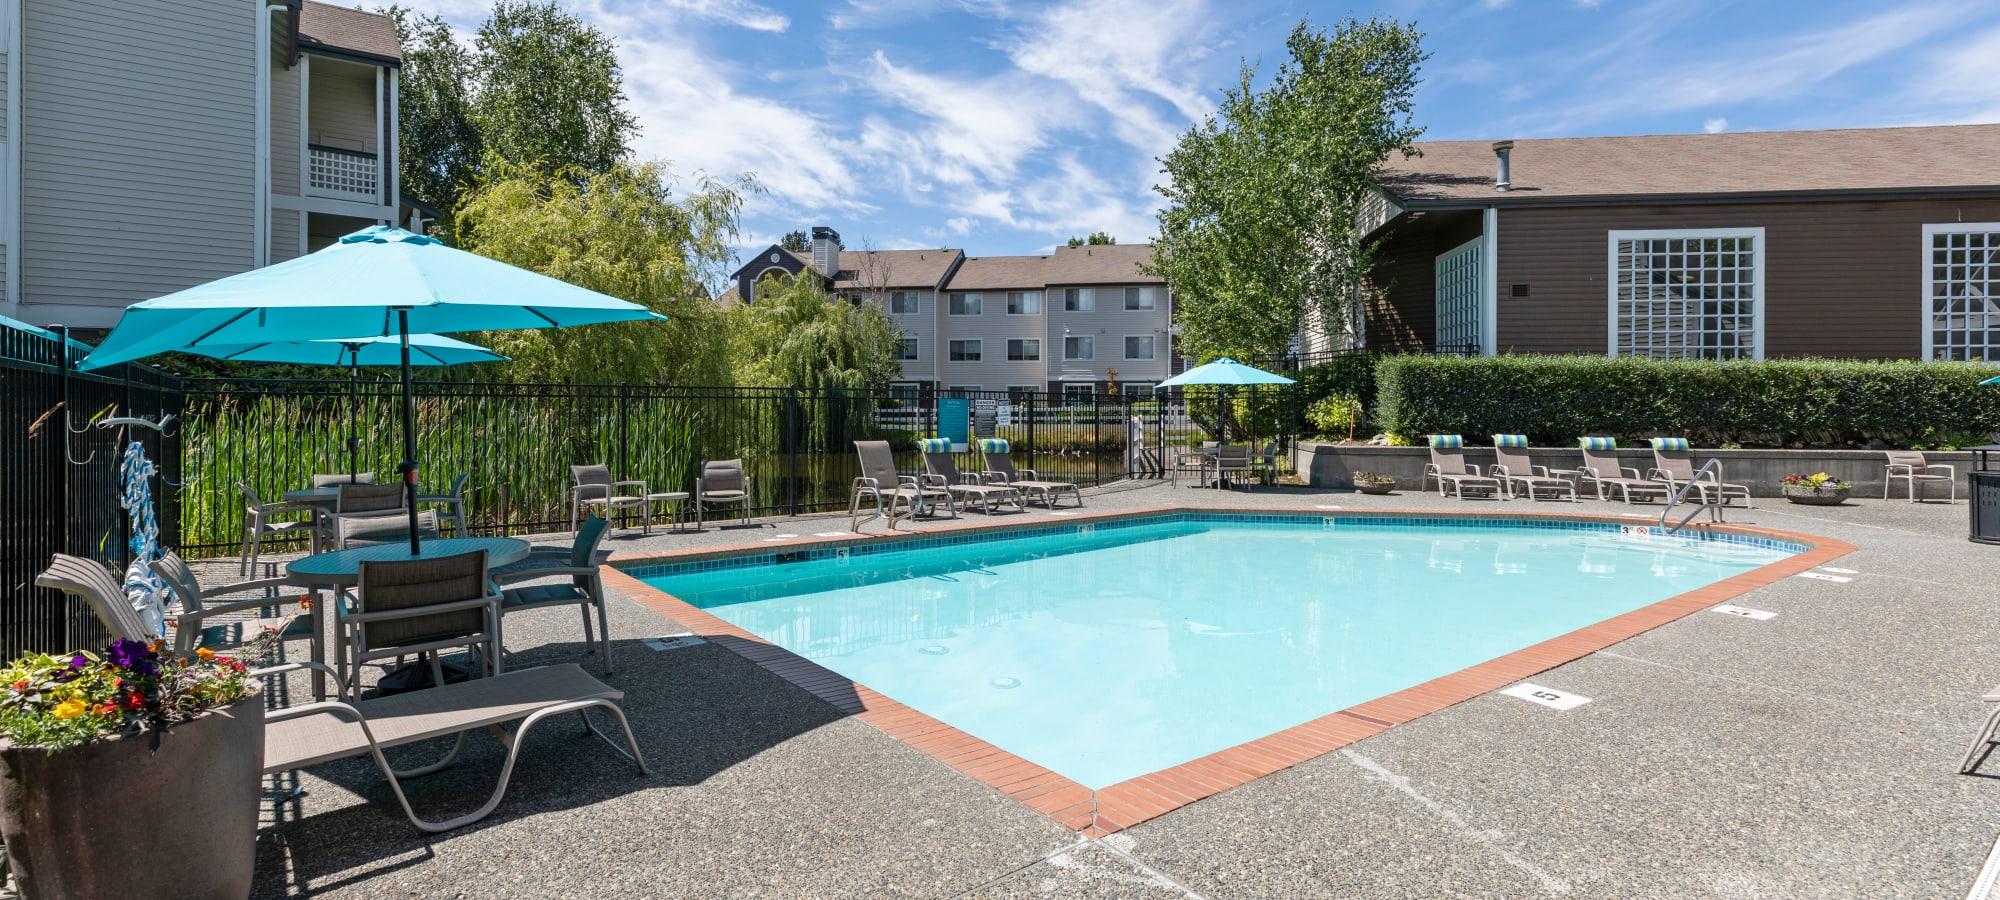 Olin Fields Apartments in Everett, Washington